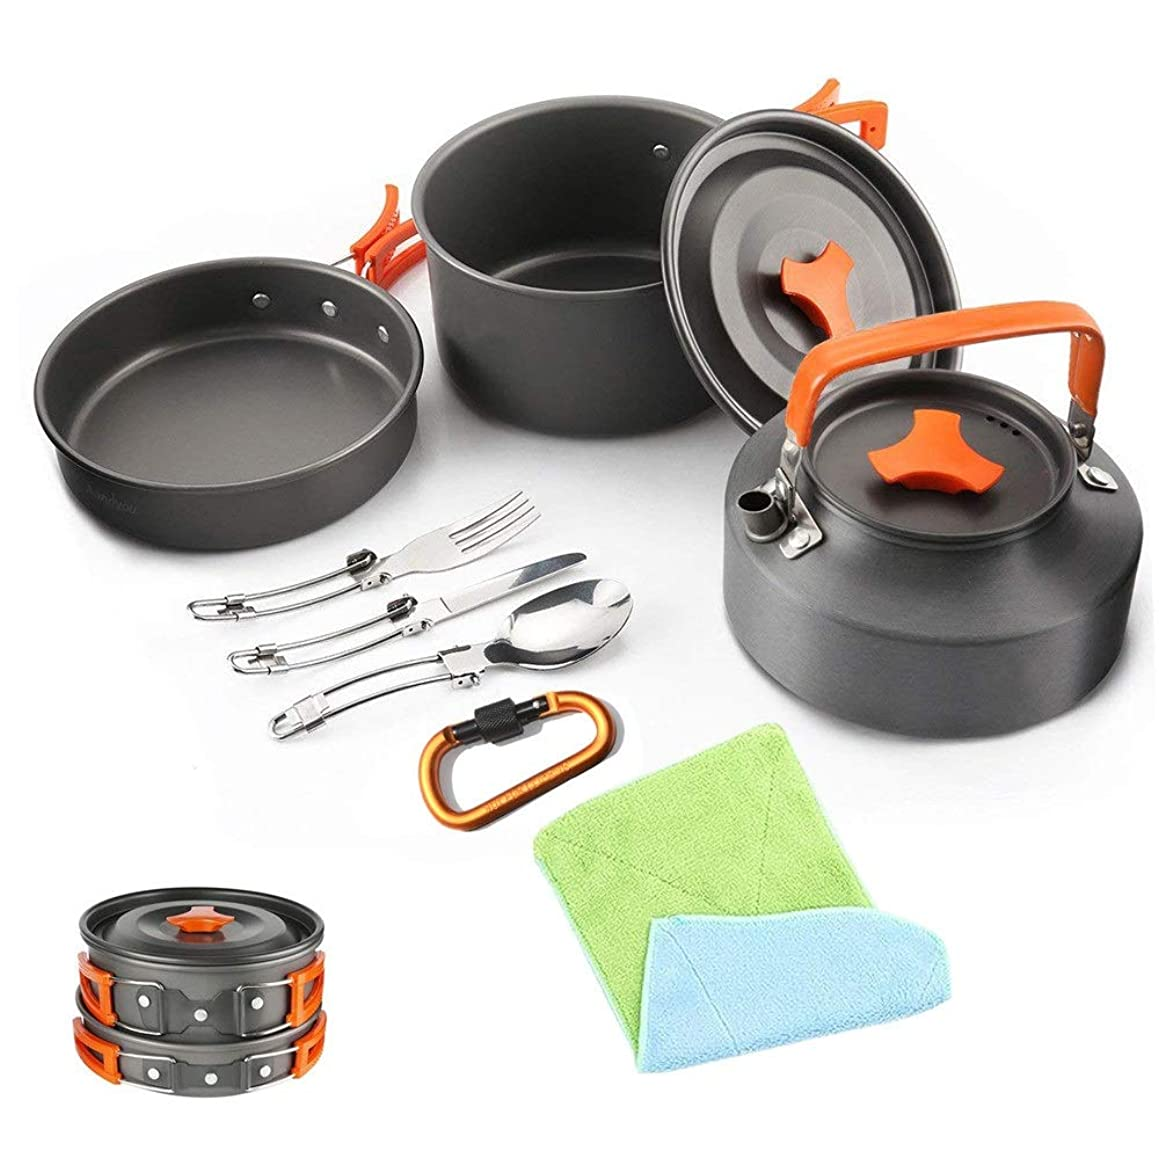 Zxcvlina Portable Camping Pot pan Collapsible Lightweight Aluminium Camping Cookware Mess Kit Pot Pan Kettle Spork Hook Cooking Equipment Outdoor Backpacking Cookset with Mesh Bag